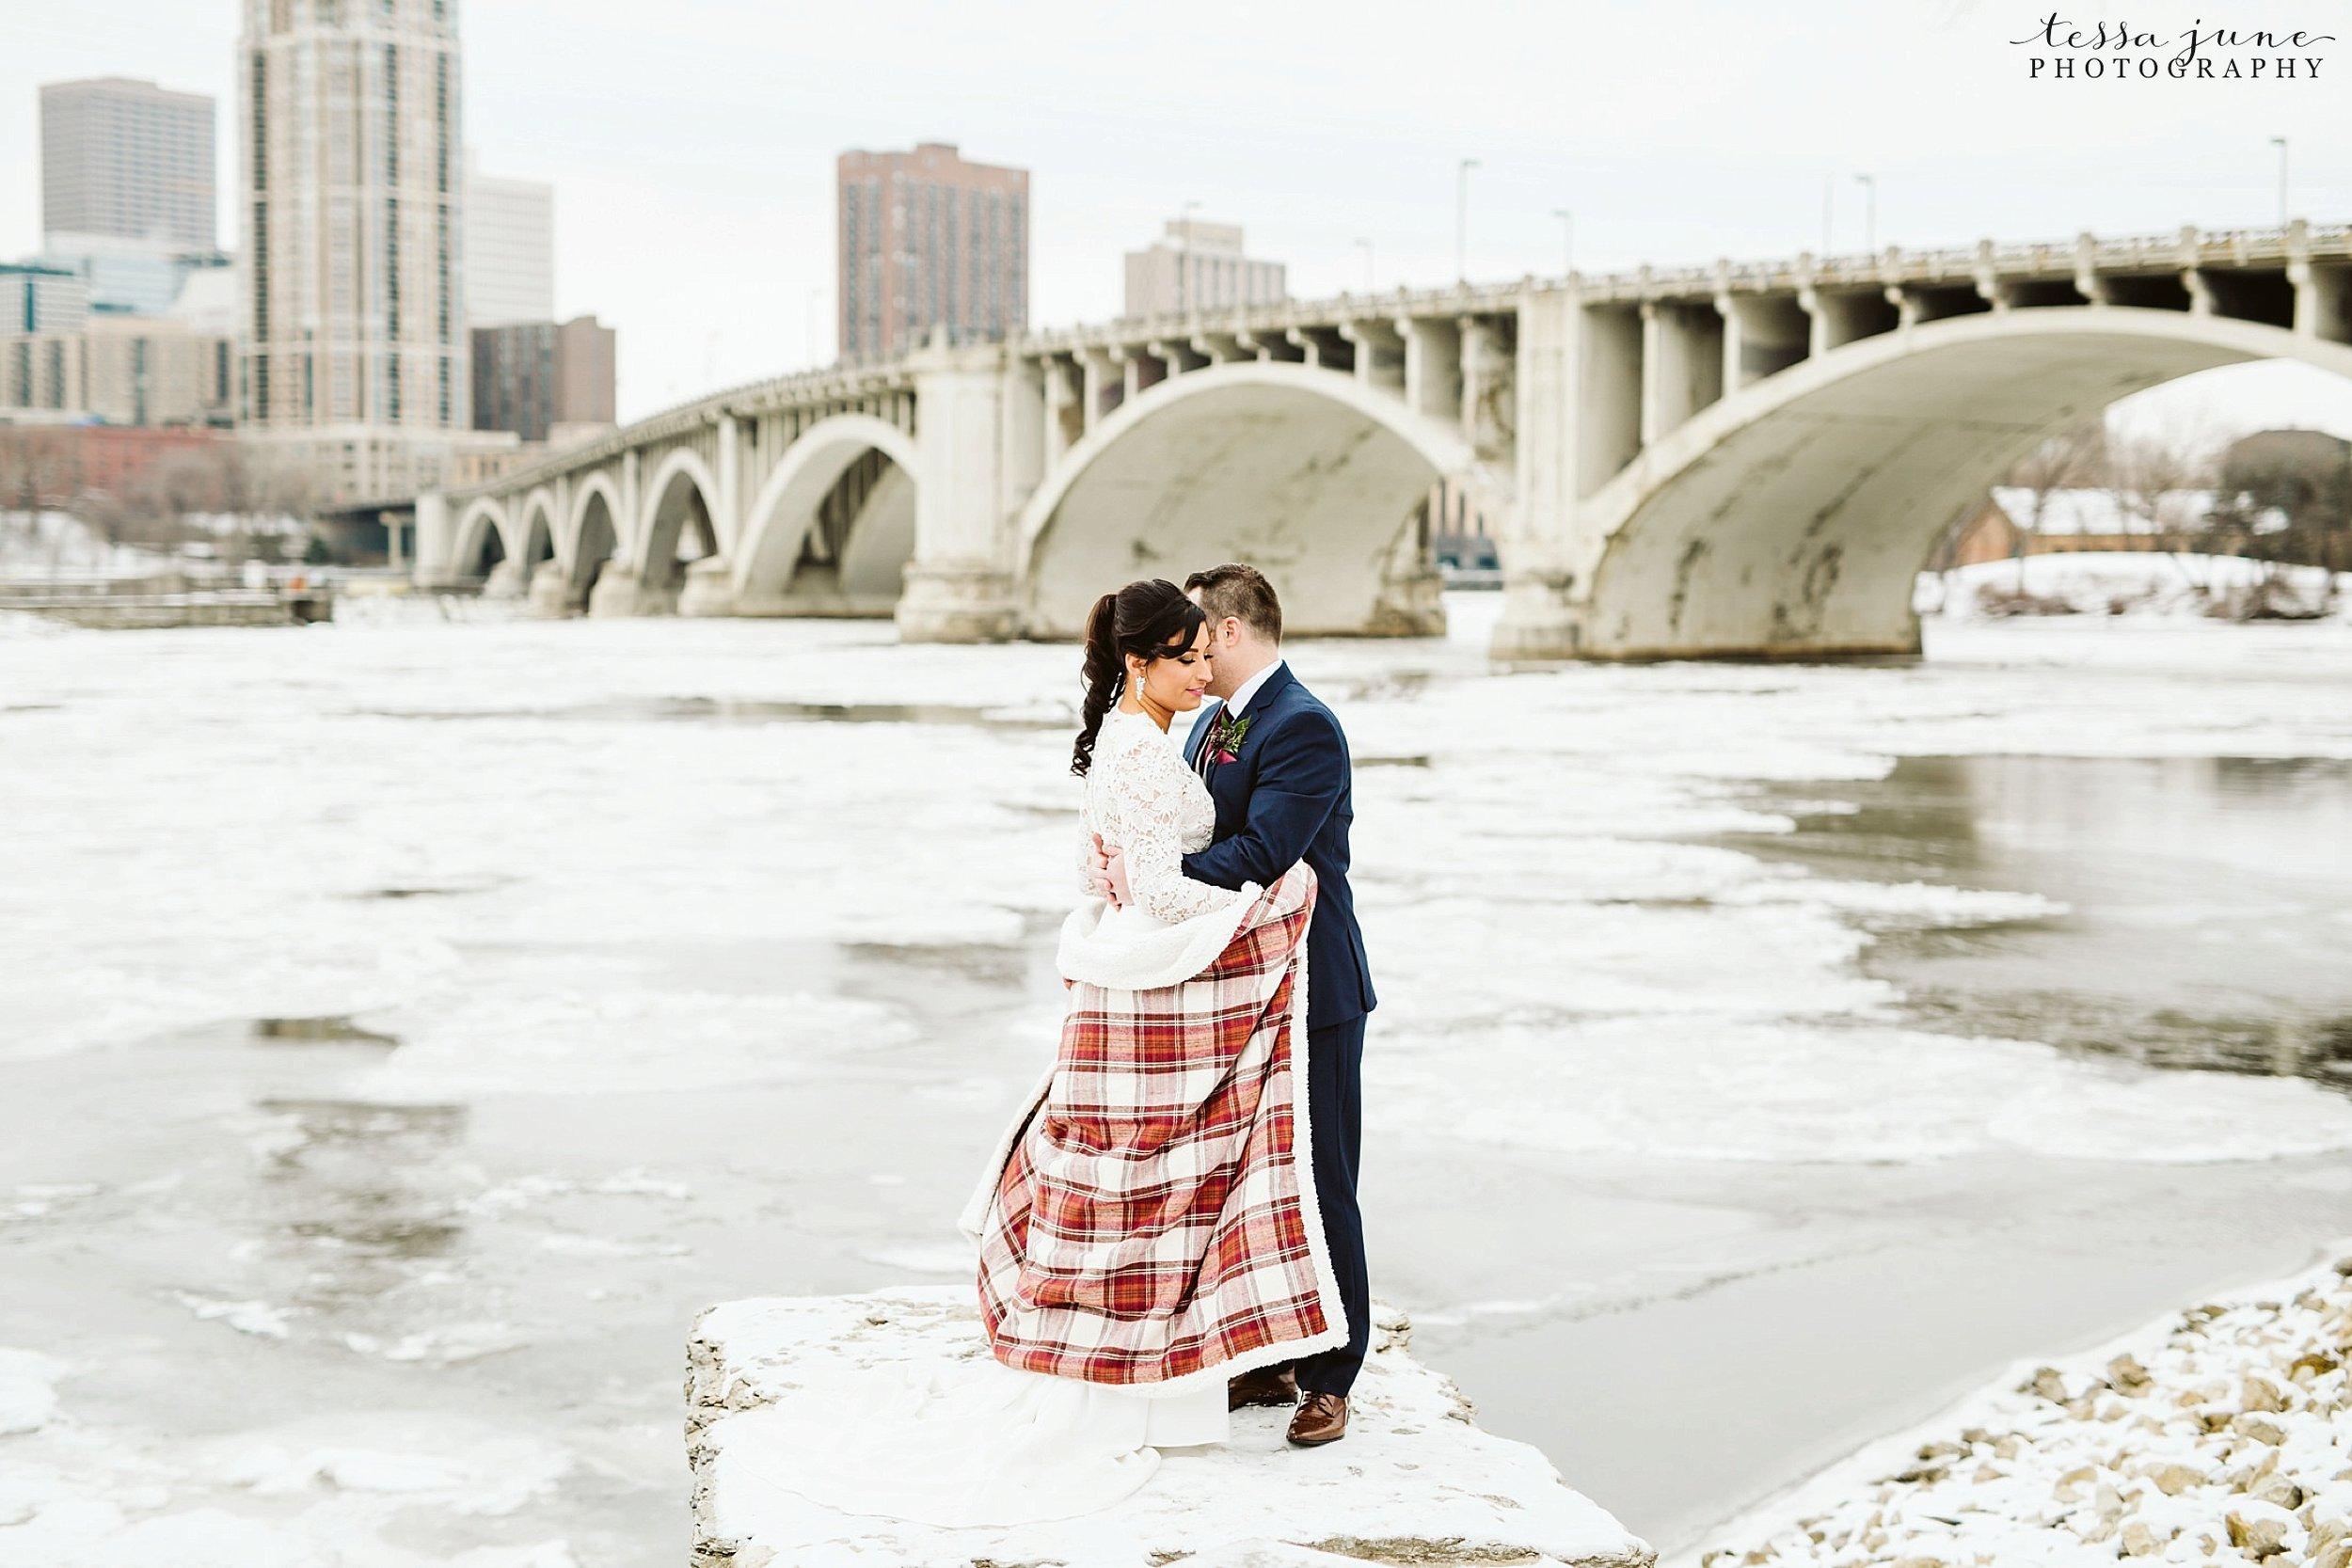 minneapolis-event-center-winter-romantic-snow-wedding-december-84.jpg